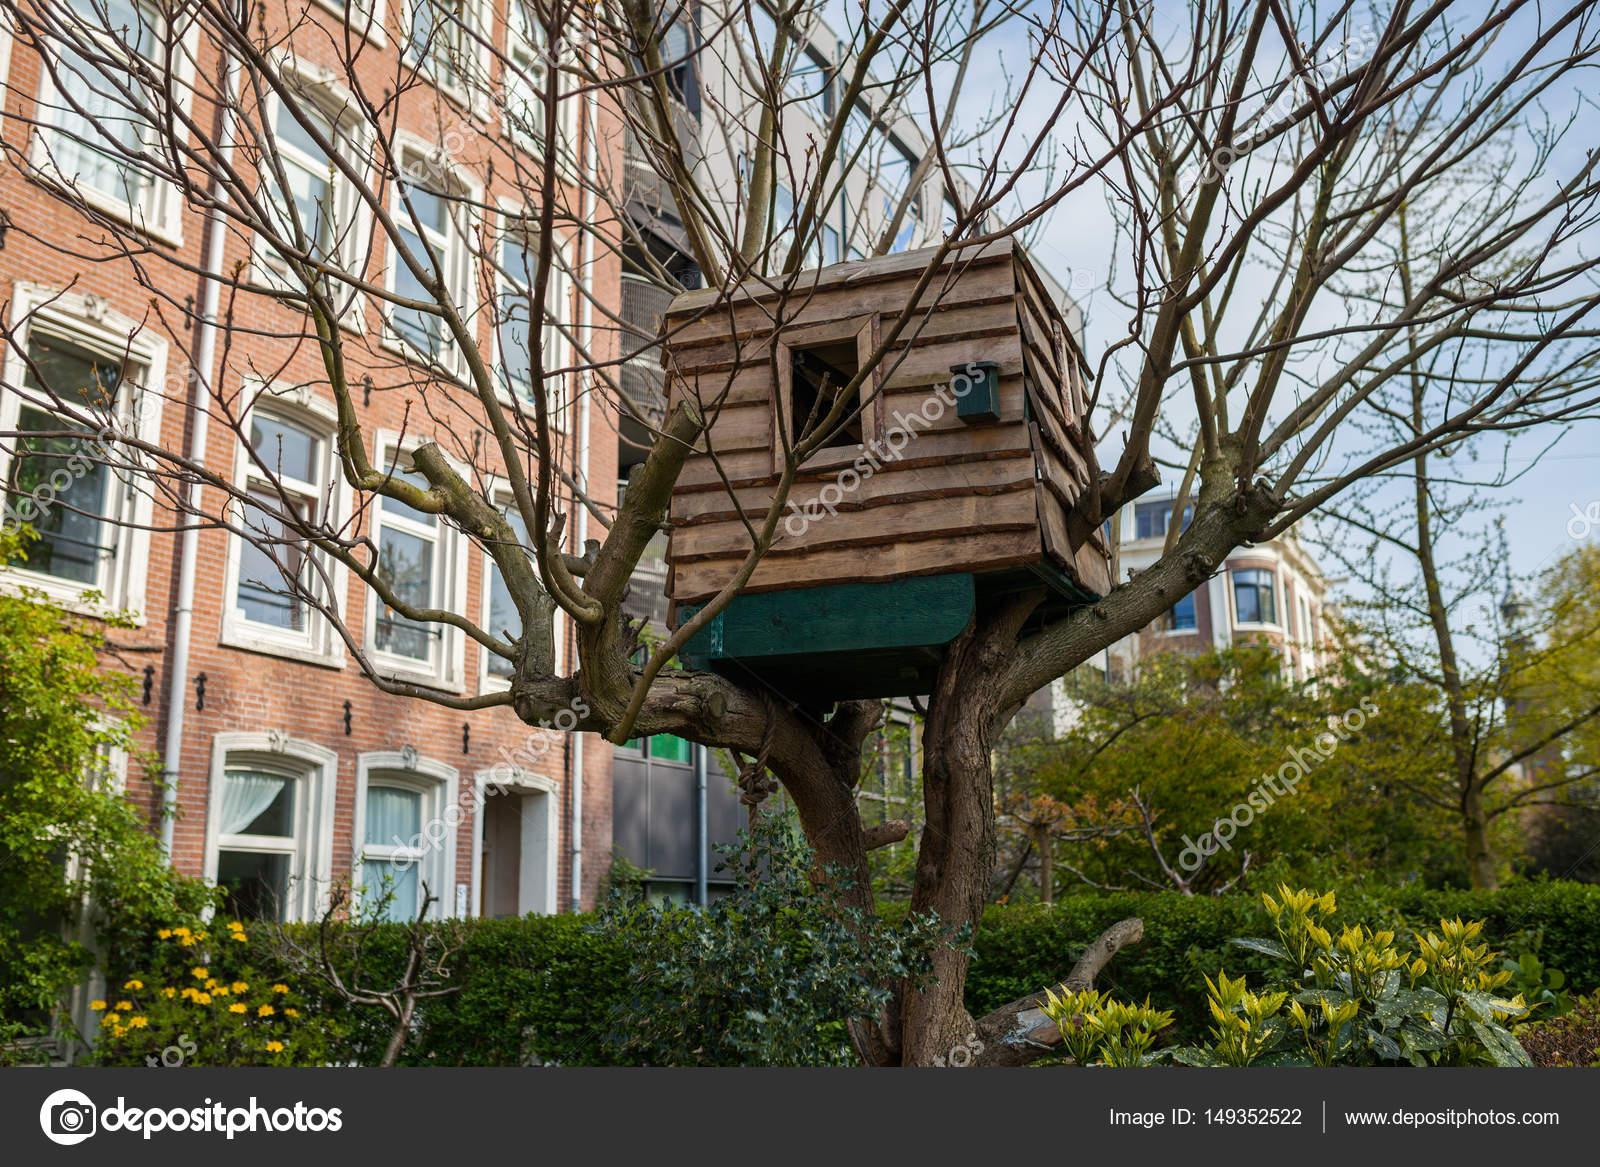 Picture of: Children Tree House In Amsterdam Stock Photo C Sashk0 149352522